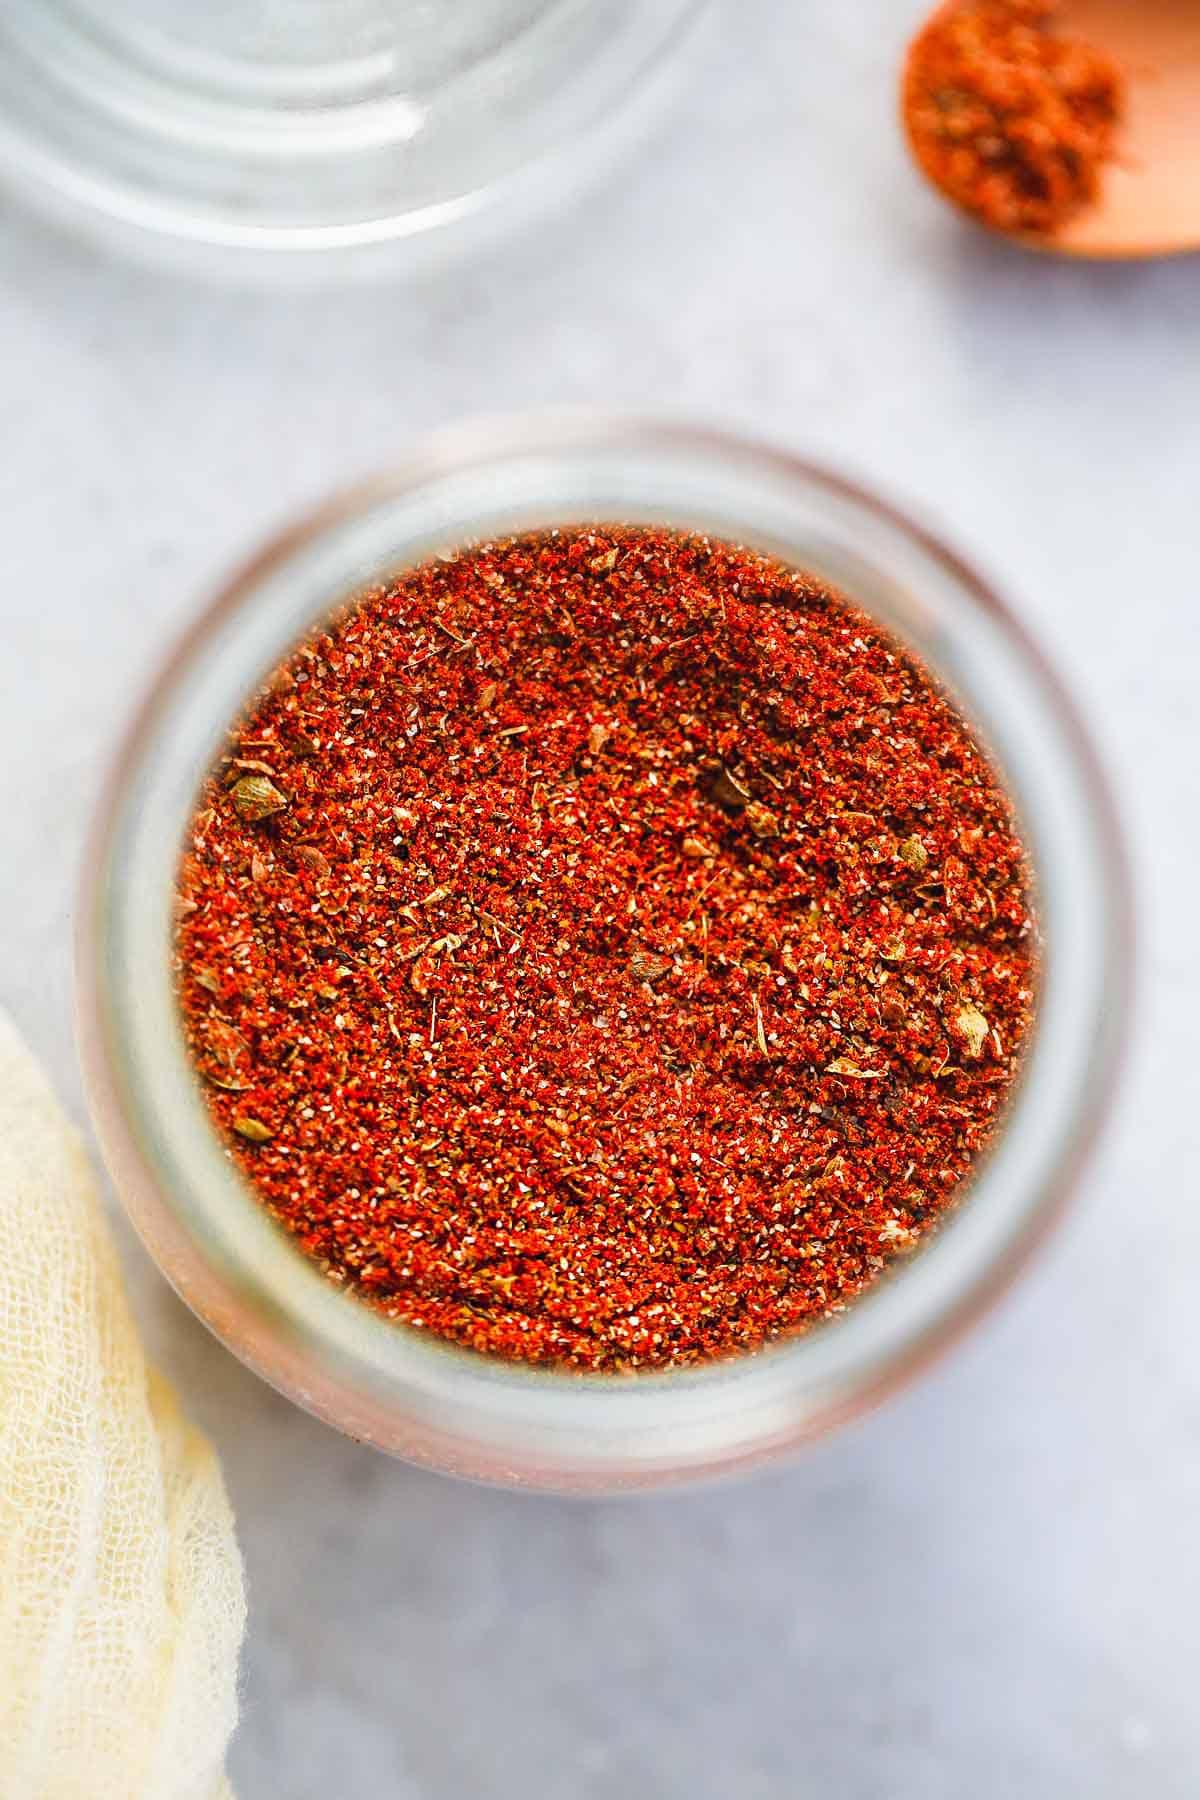 A close up shot of fajita seasoning in a Weck jar, top view.